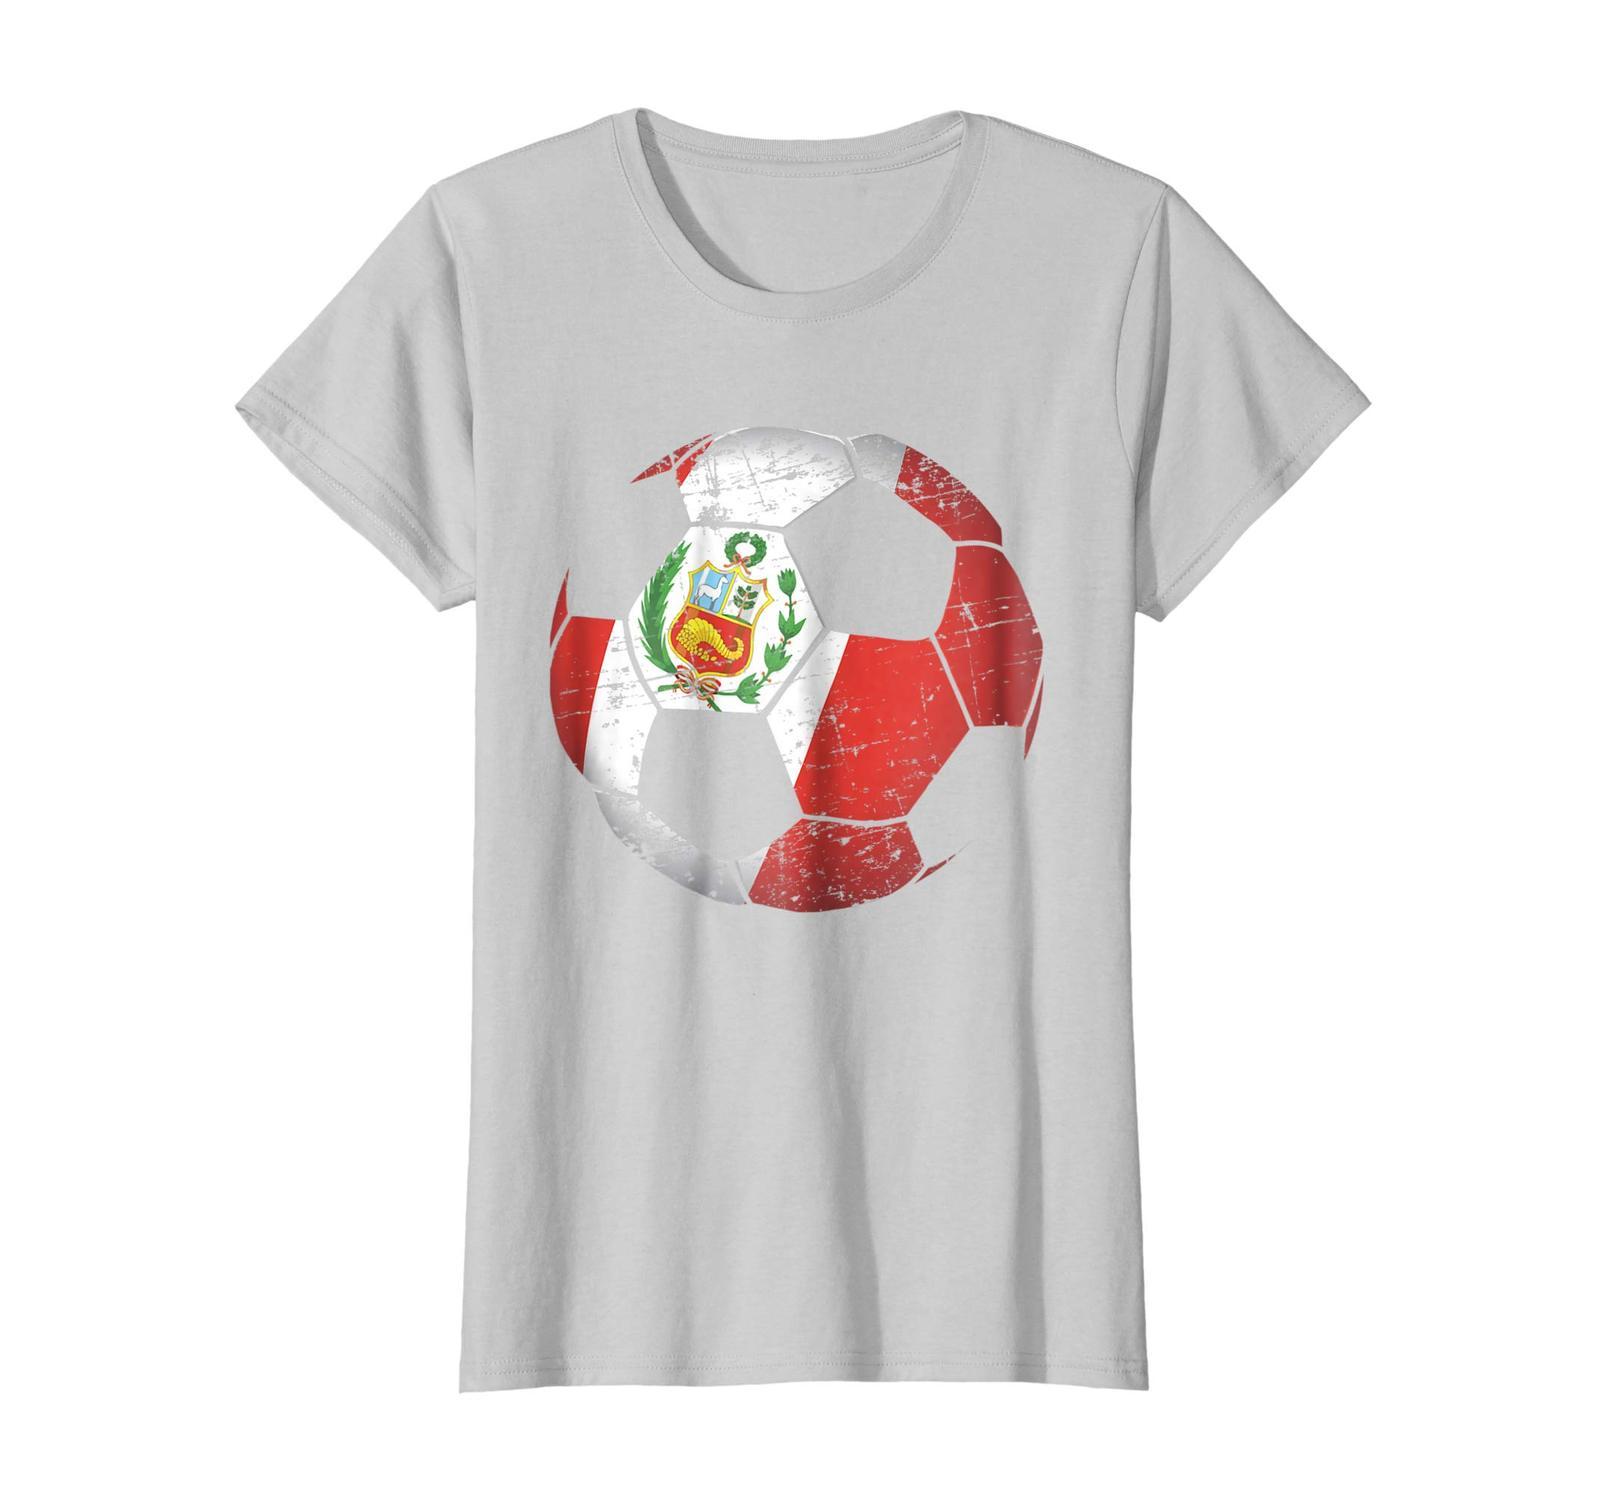 250f9b13f Dad Shirts - Peru Soccer Ball Flag Jersey Shirt - Peruvian Football Wowen